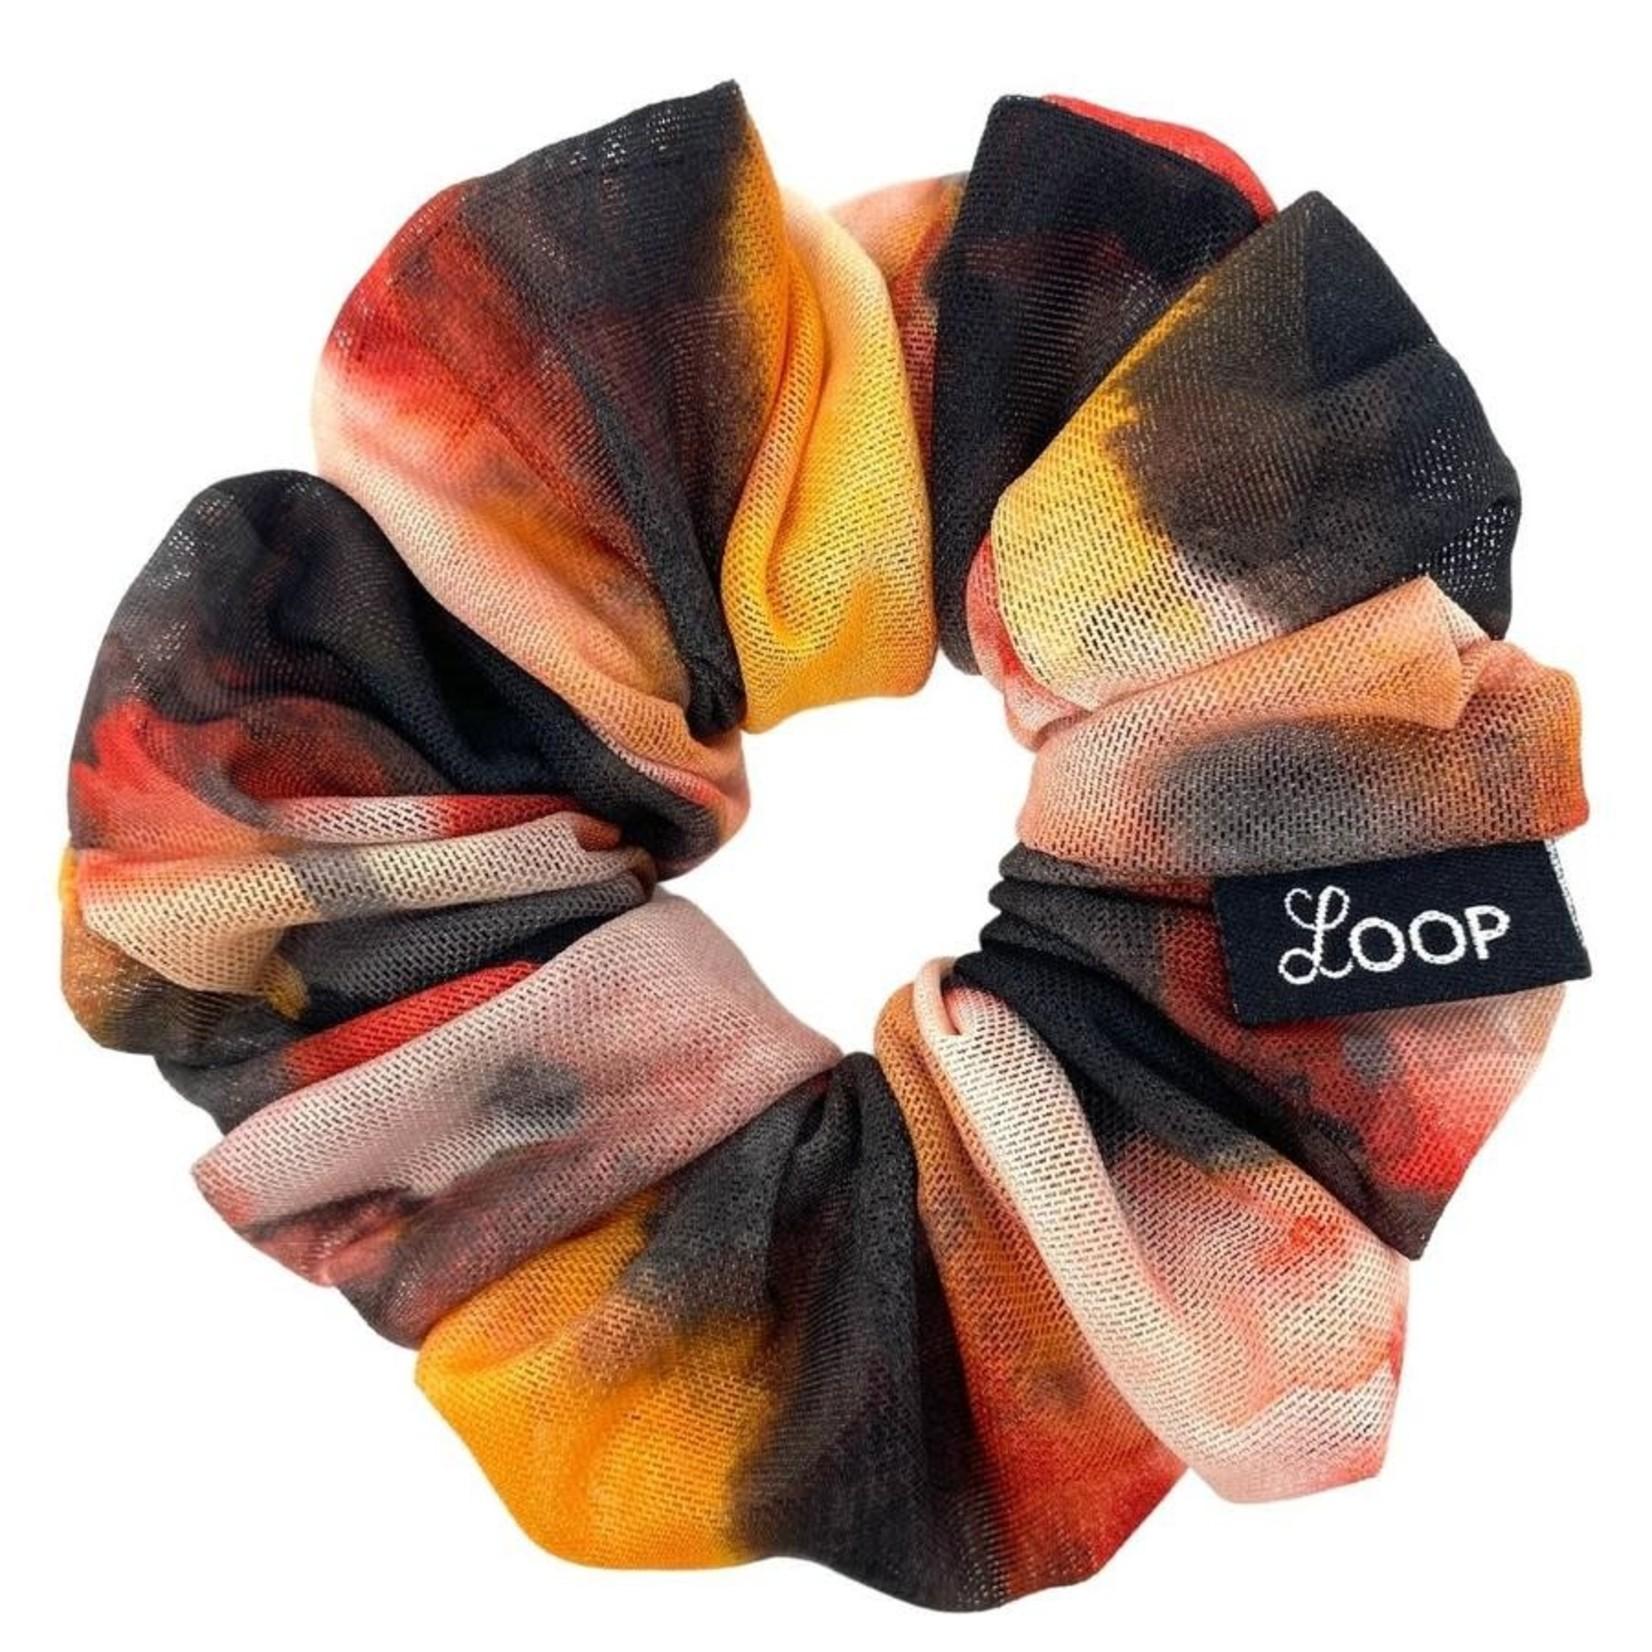 loop Loop  - Fall Shades Mesh